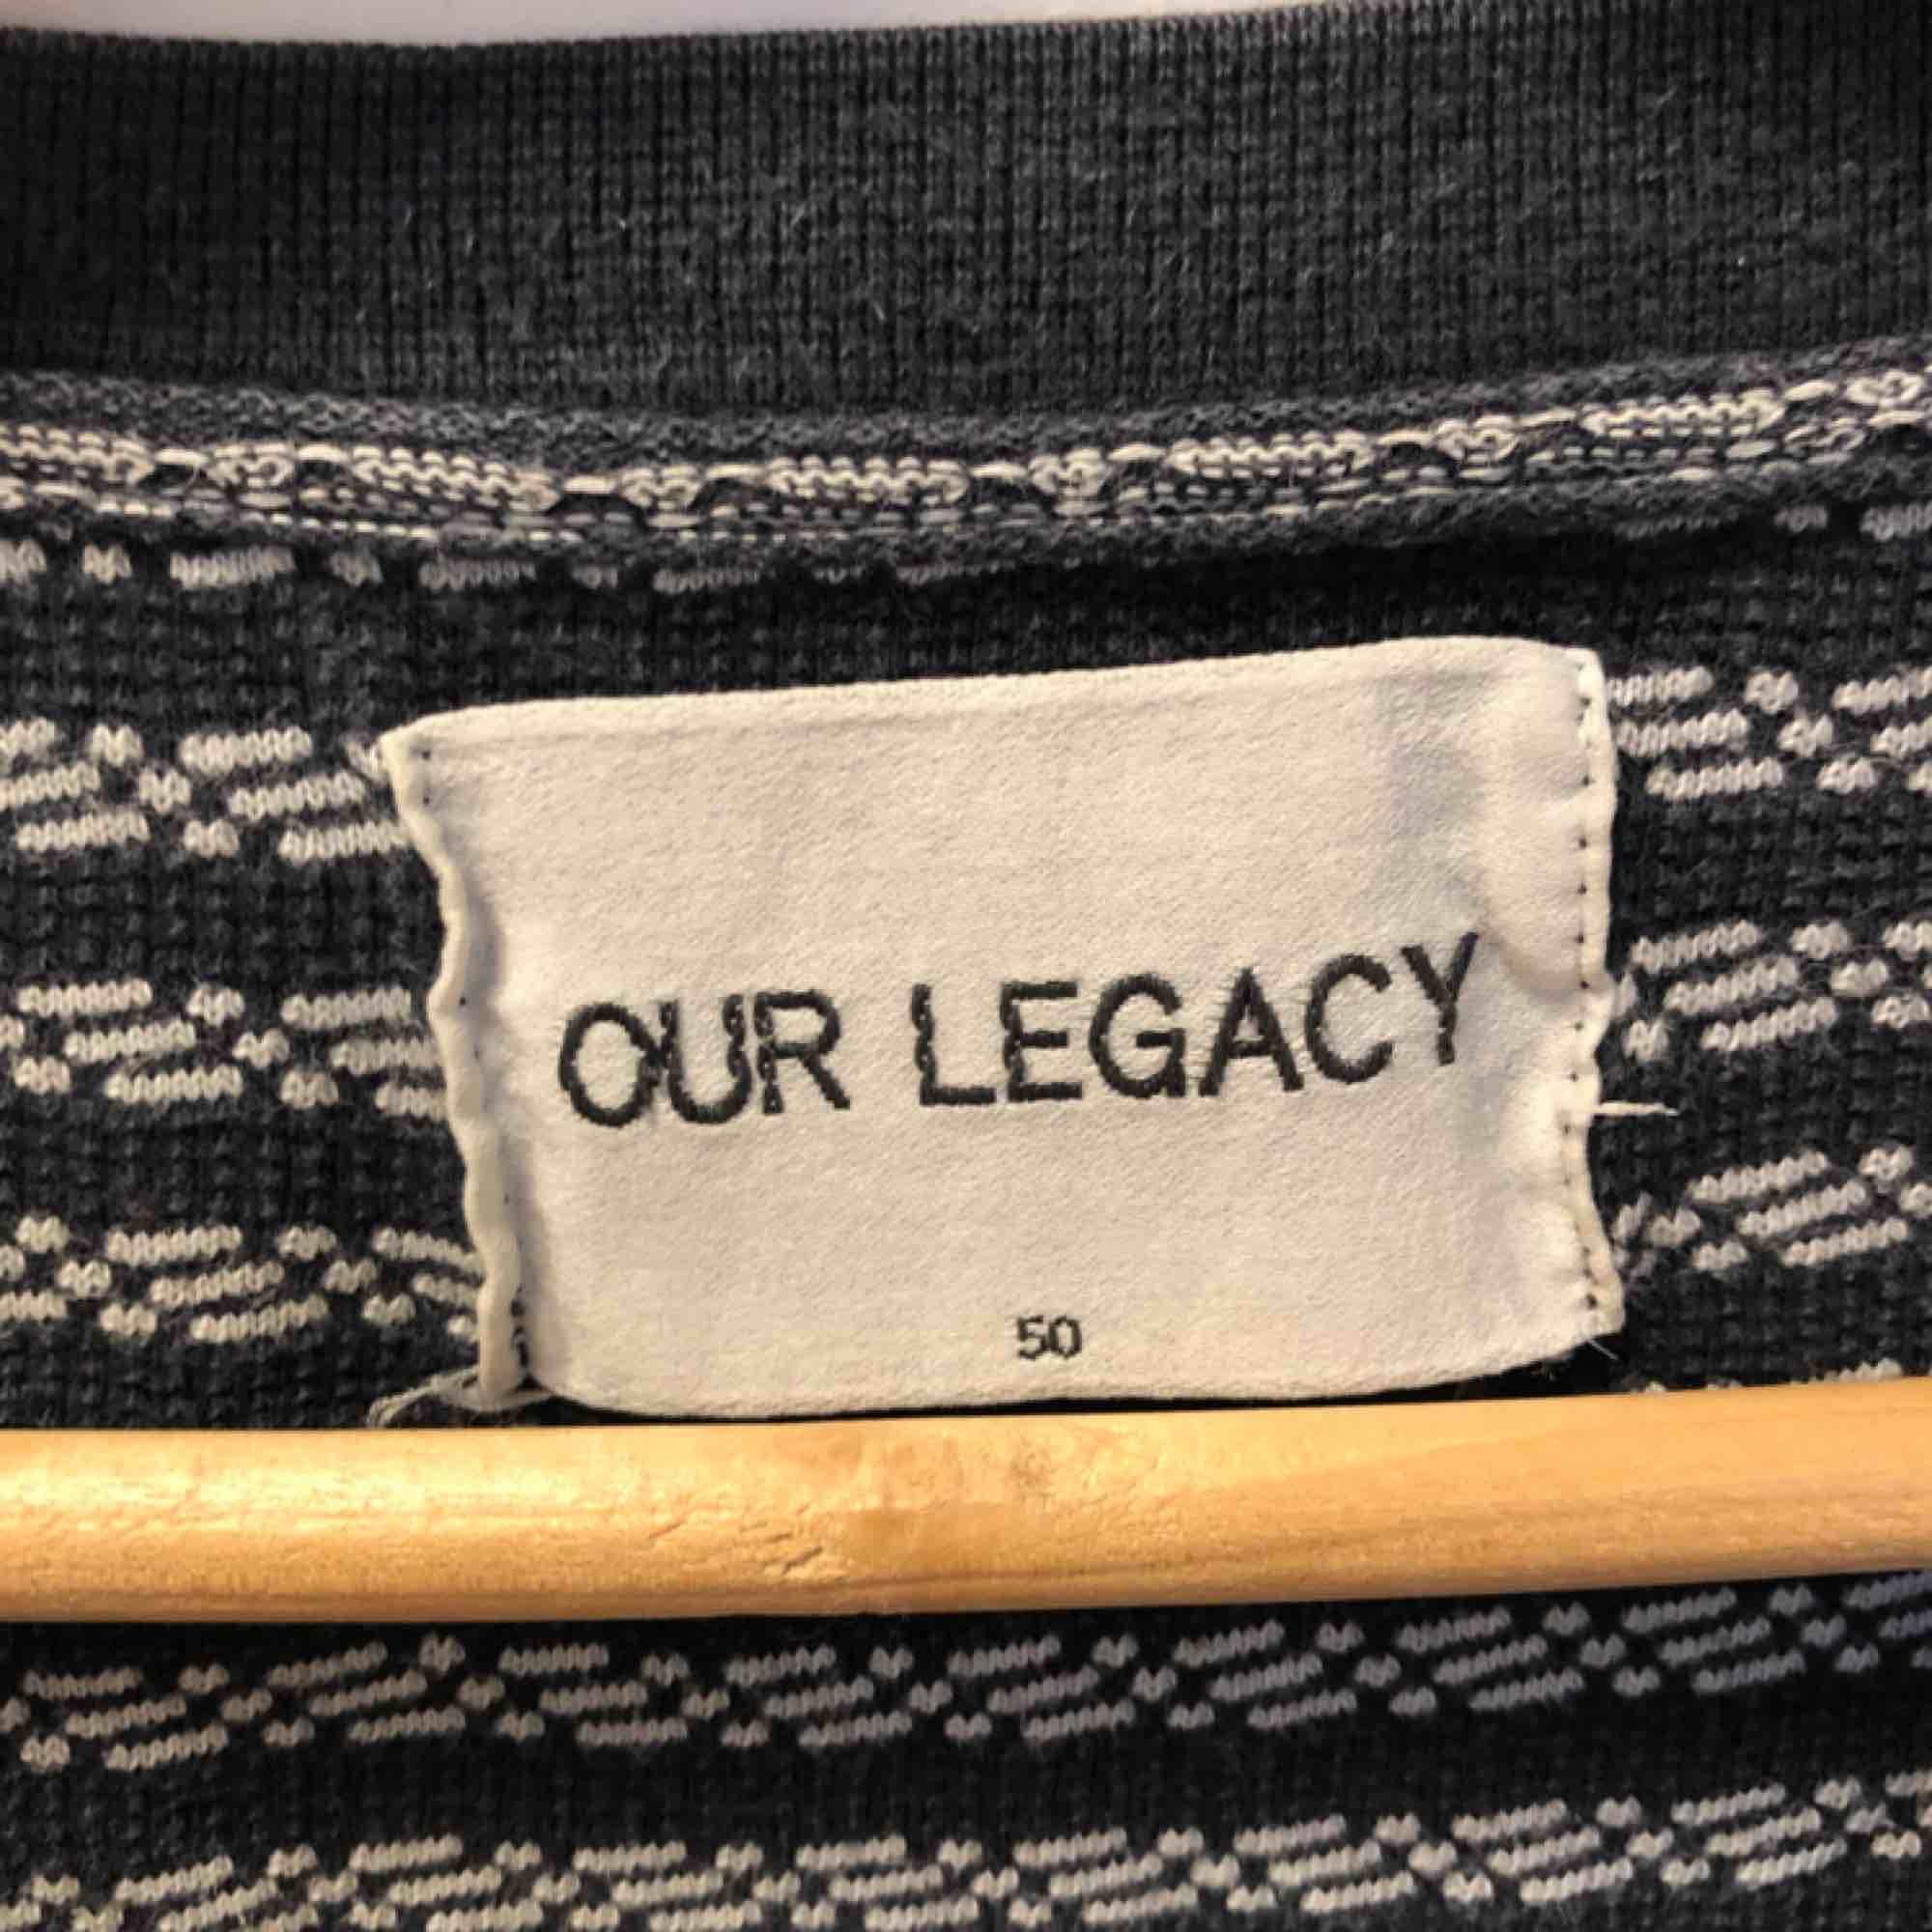 Tidlös och fin stickad t-shirt från Our legacy . T-shirts.